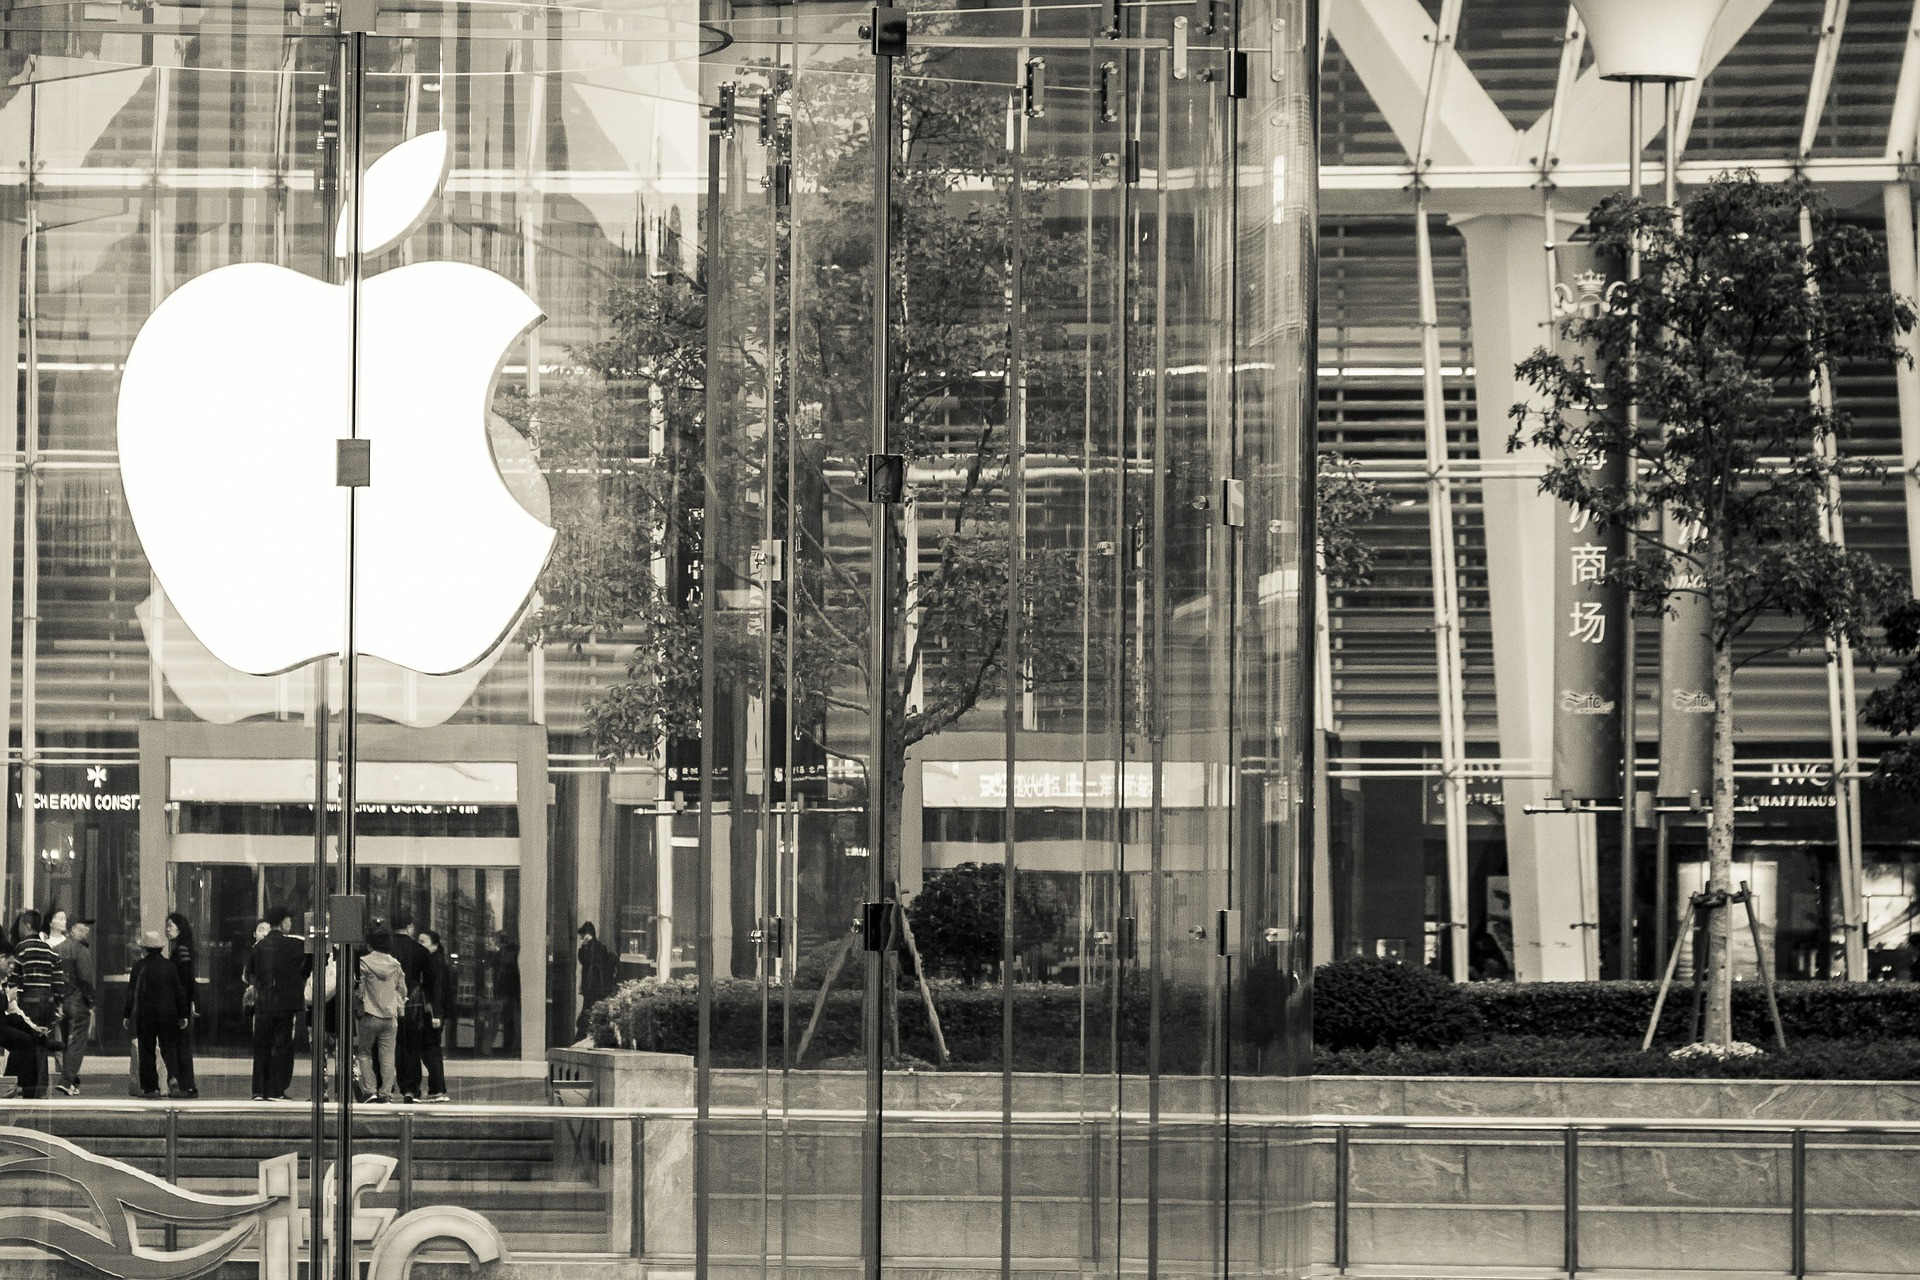 Unfortunately, Apple's Latest Device Isn't a Siri Wireless Speaker